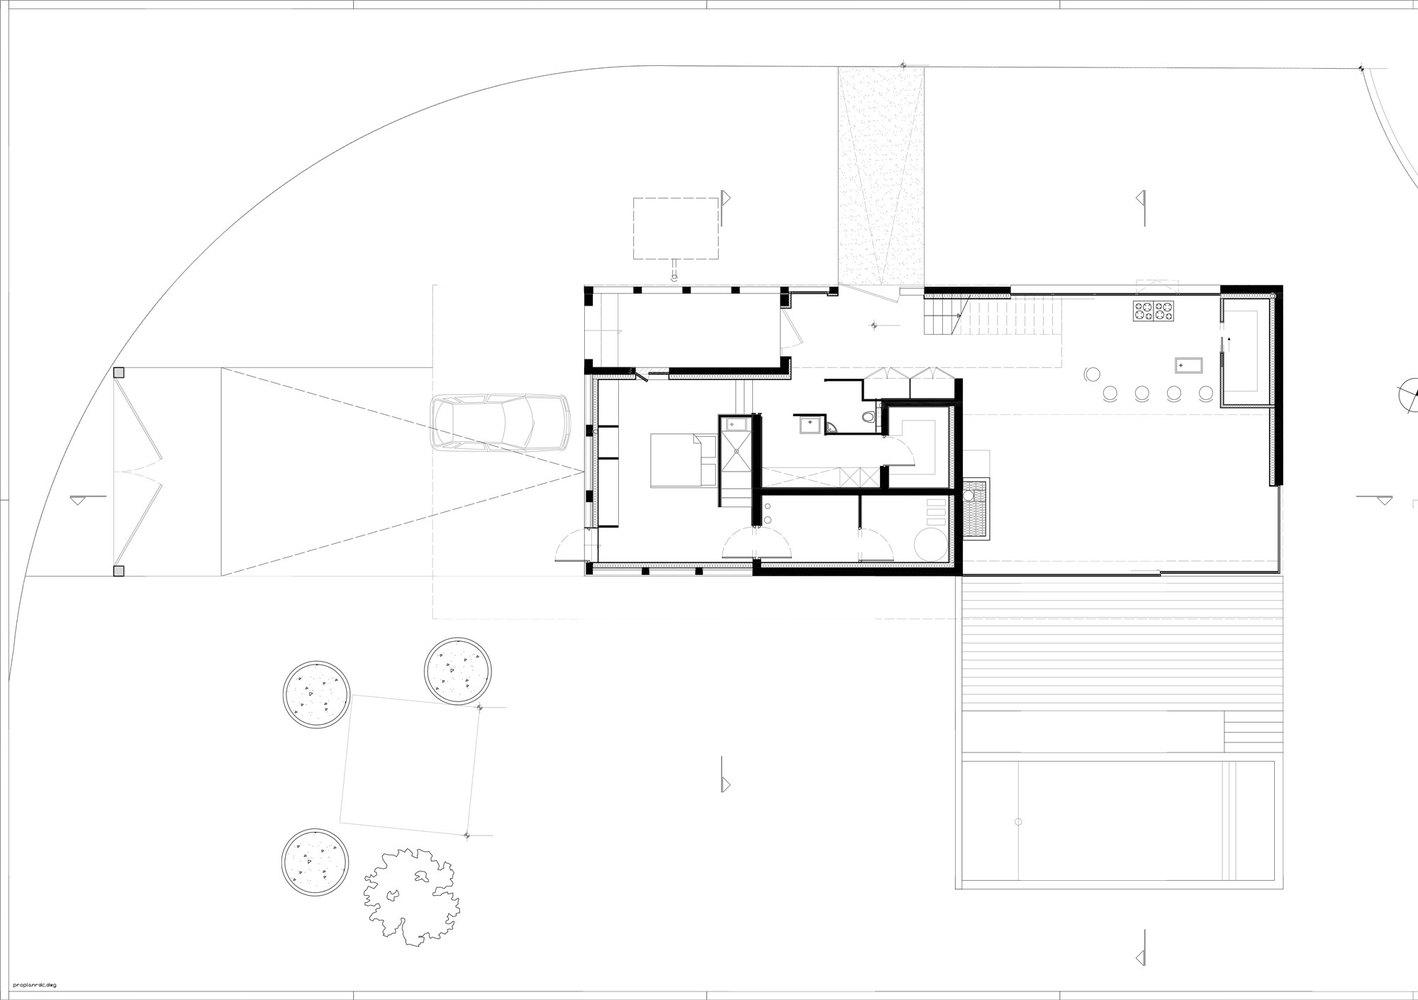 chipster blister house ground floor plan [ 1418 x 1000 Pixel ]